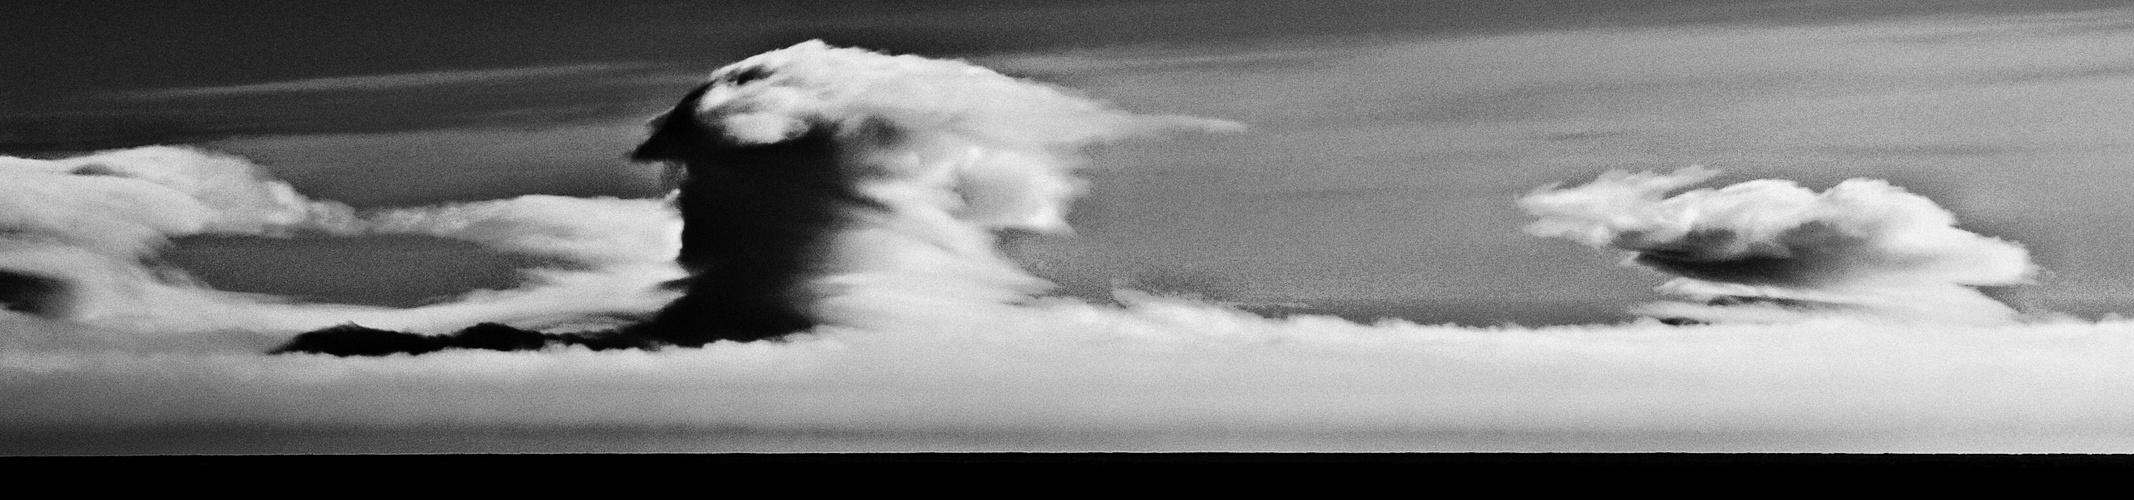 wolken am horizont ...